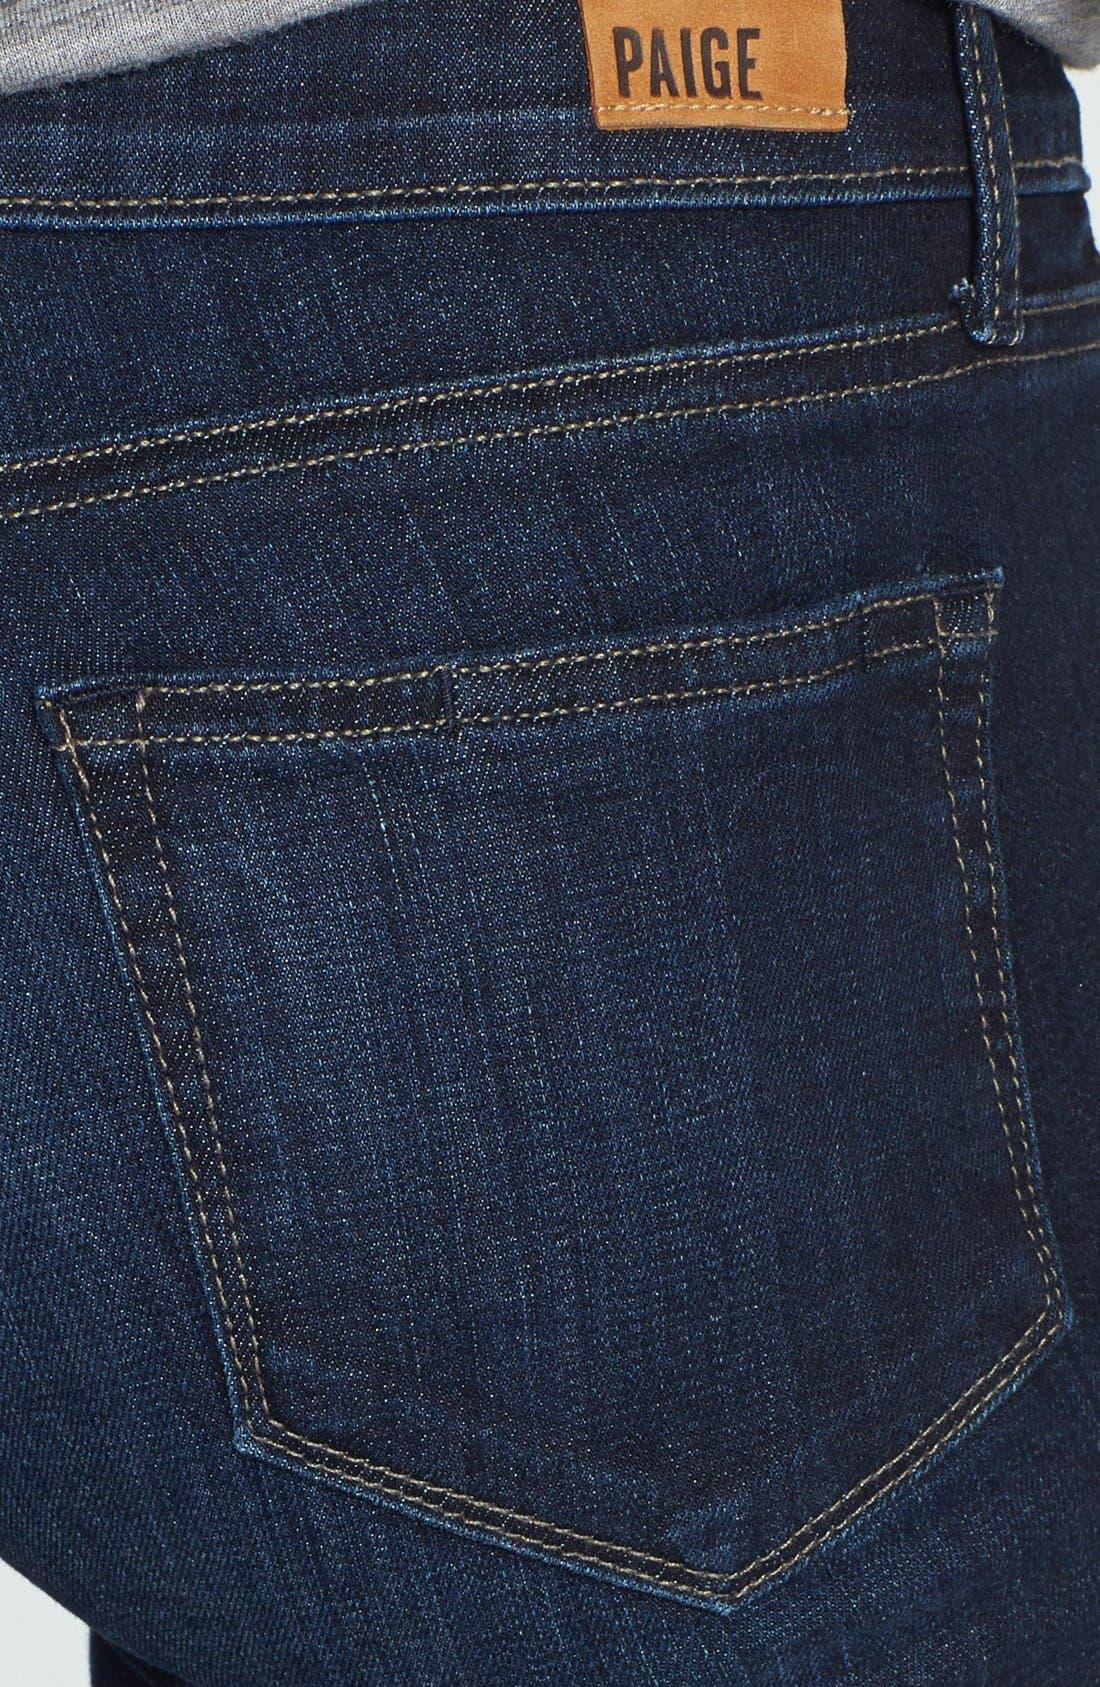 Alternate Image 3  - Paige Denim 'Skyline' Skinny Jeans (Trinity)